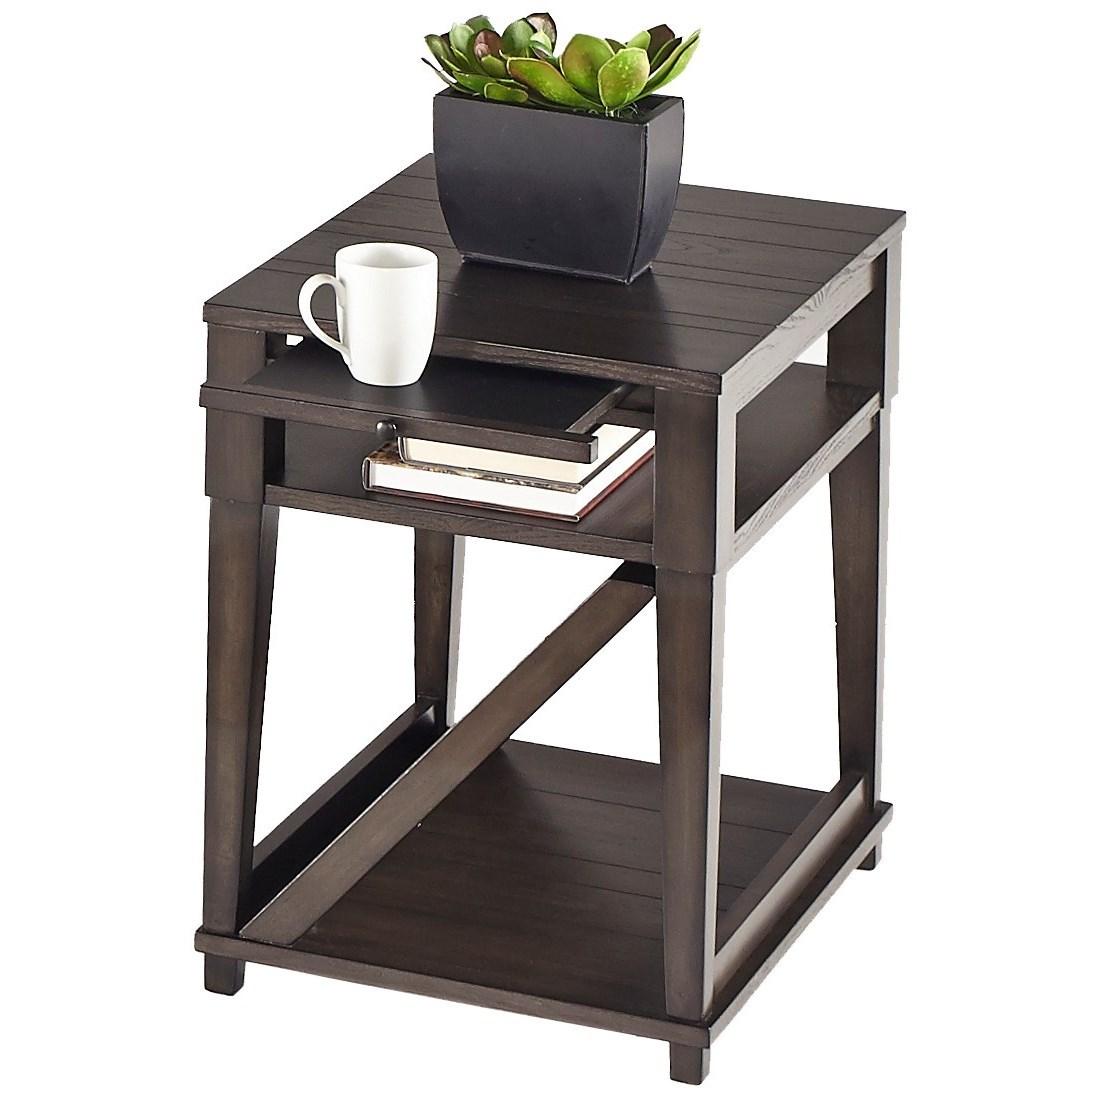 Progressive furniture consort oak veneer chairside table for Sofa table rules